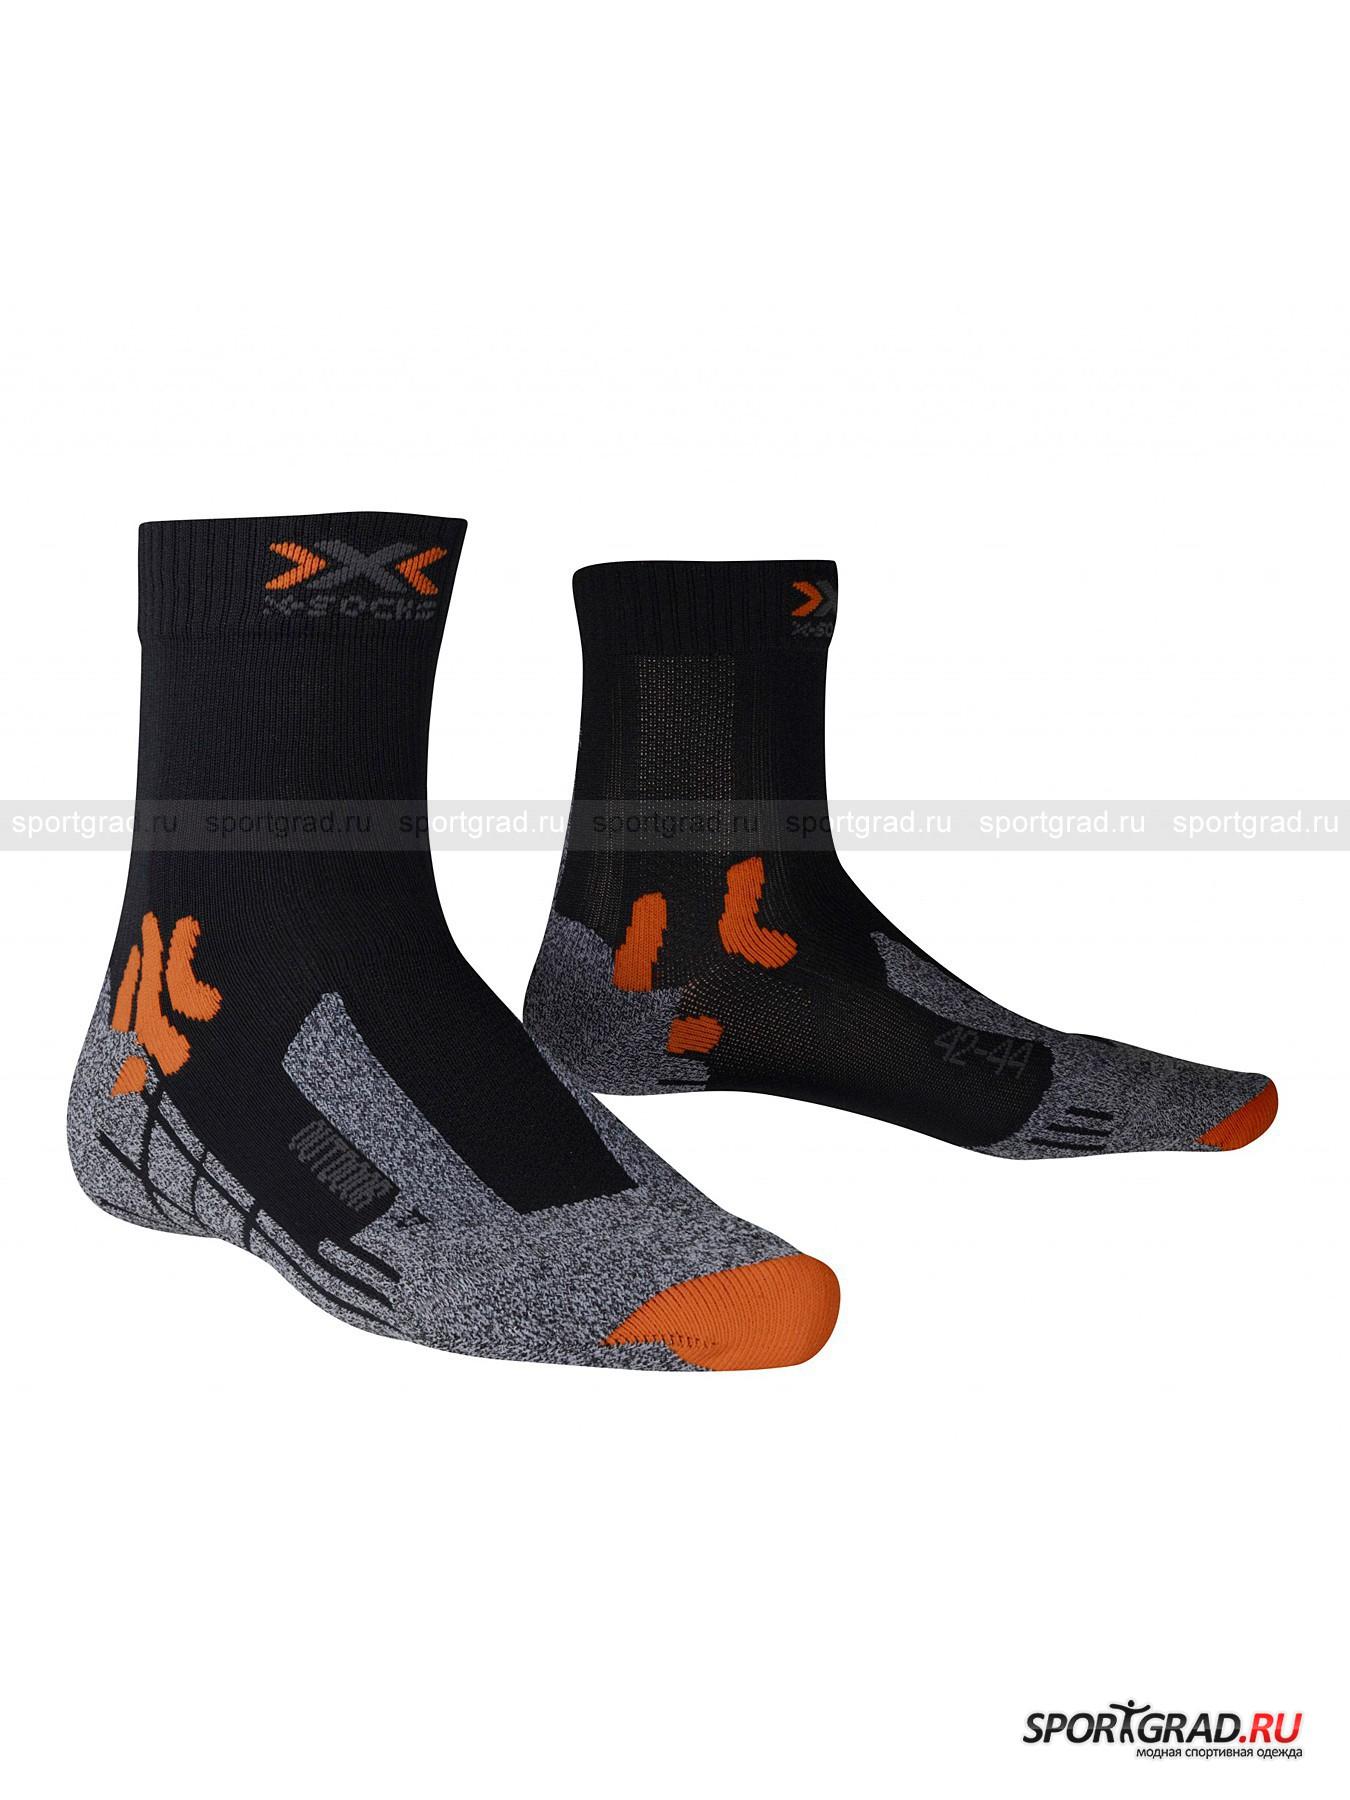 Носки унисекс OUTDOOR X-SOCKS